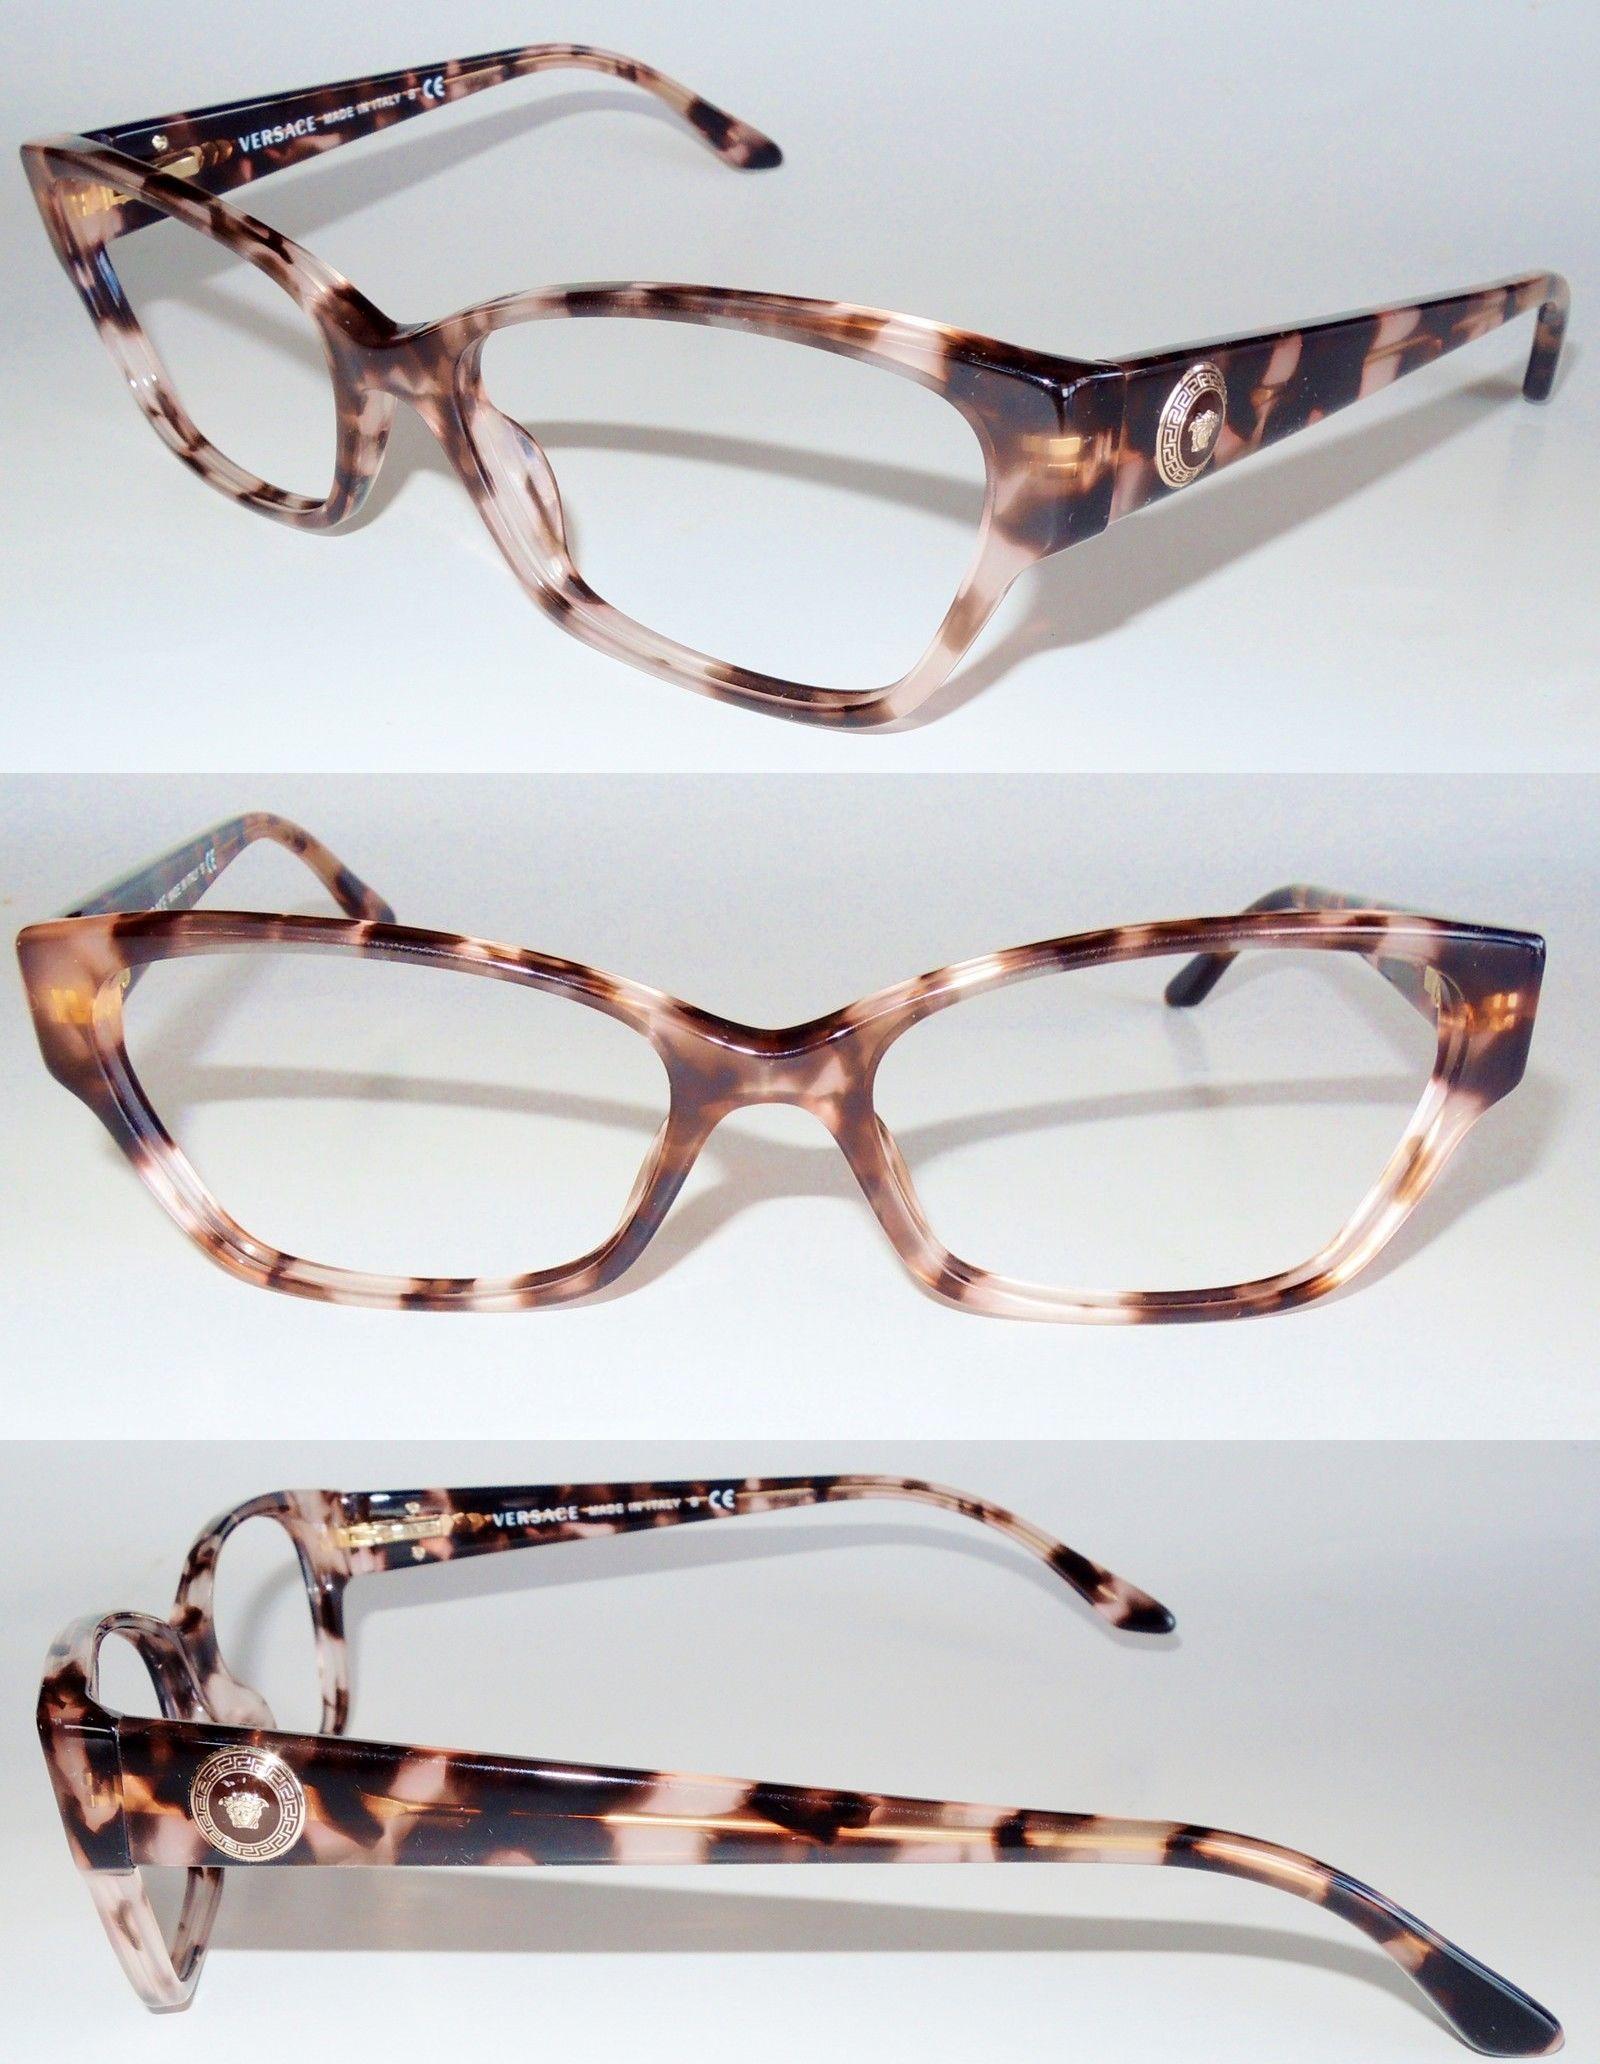 eyeglass cases versace 3172 999 tortoise acetate eyeglass frame buy it now only - Ebay Eyeglasses Frames